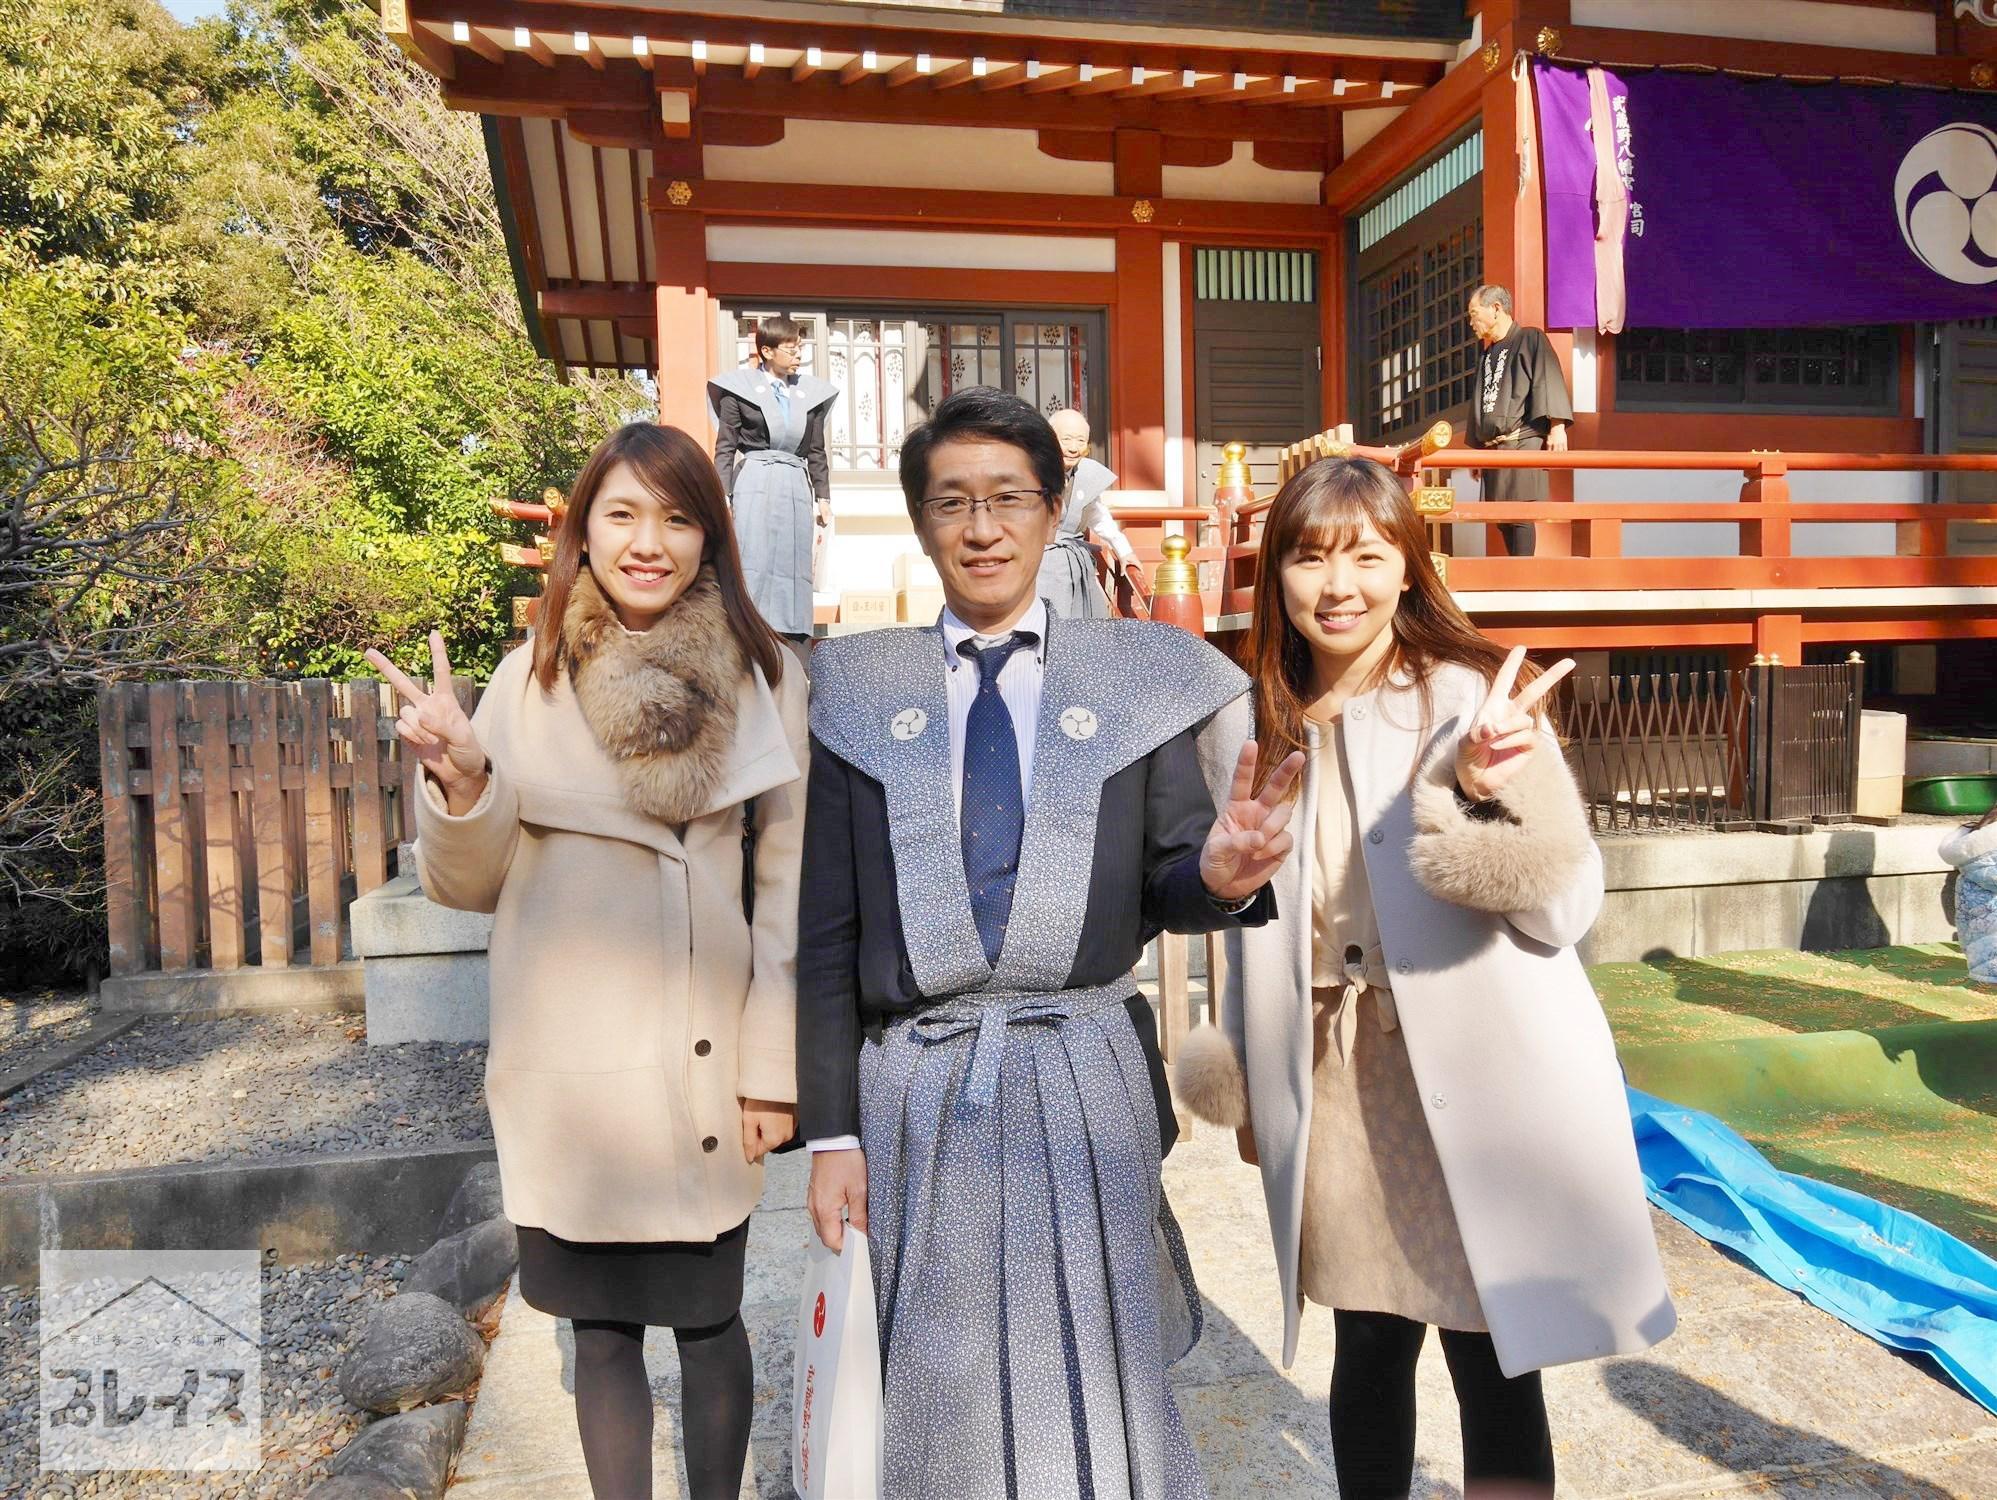 LA20190203-武蔵野八幡宮-節分祭 (50).jpg